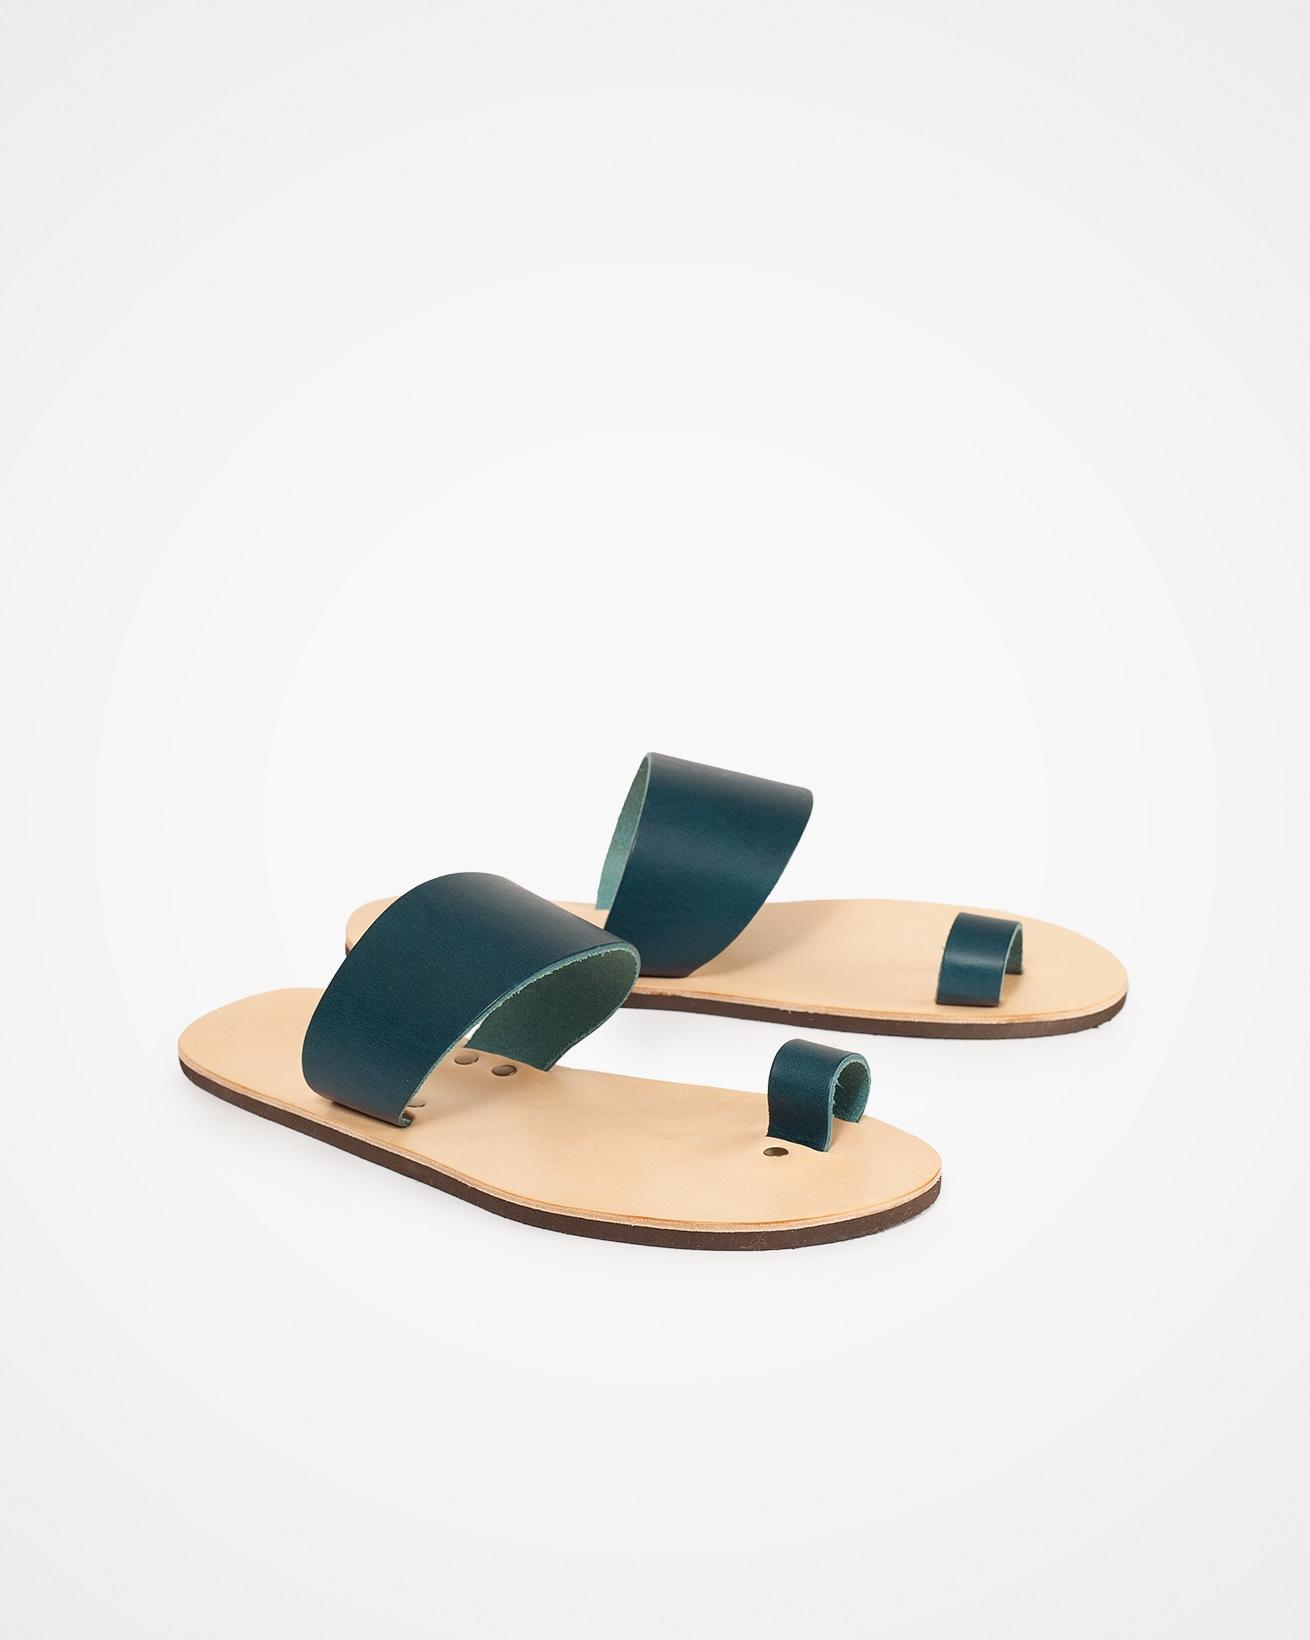 Toe Strap Sandal - UK 8 - Icelandic Blue - 1309